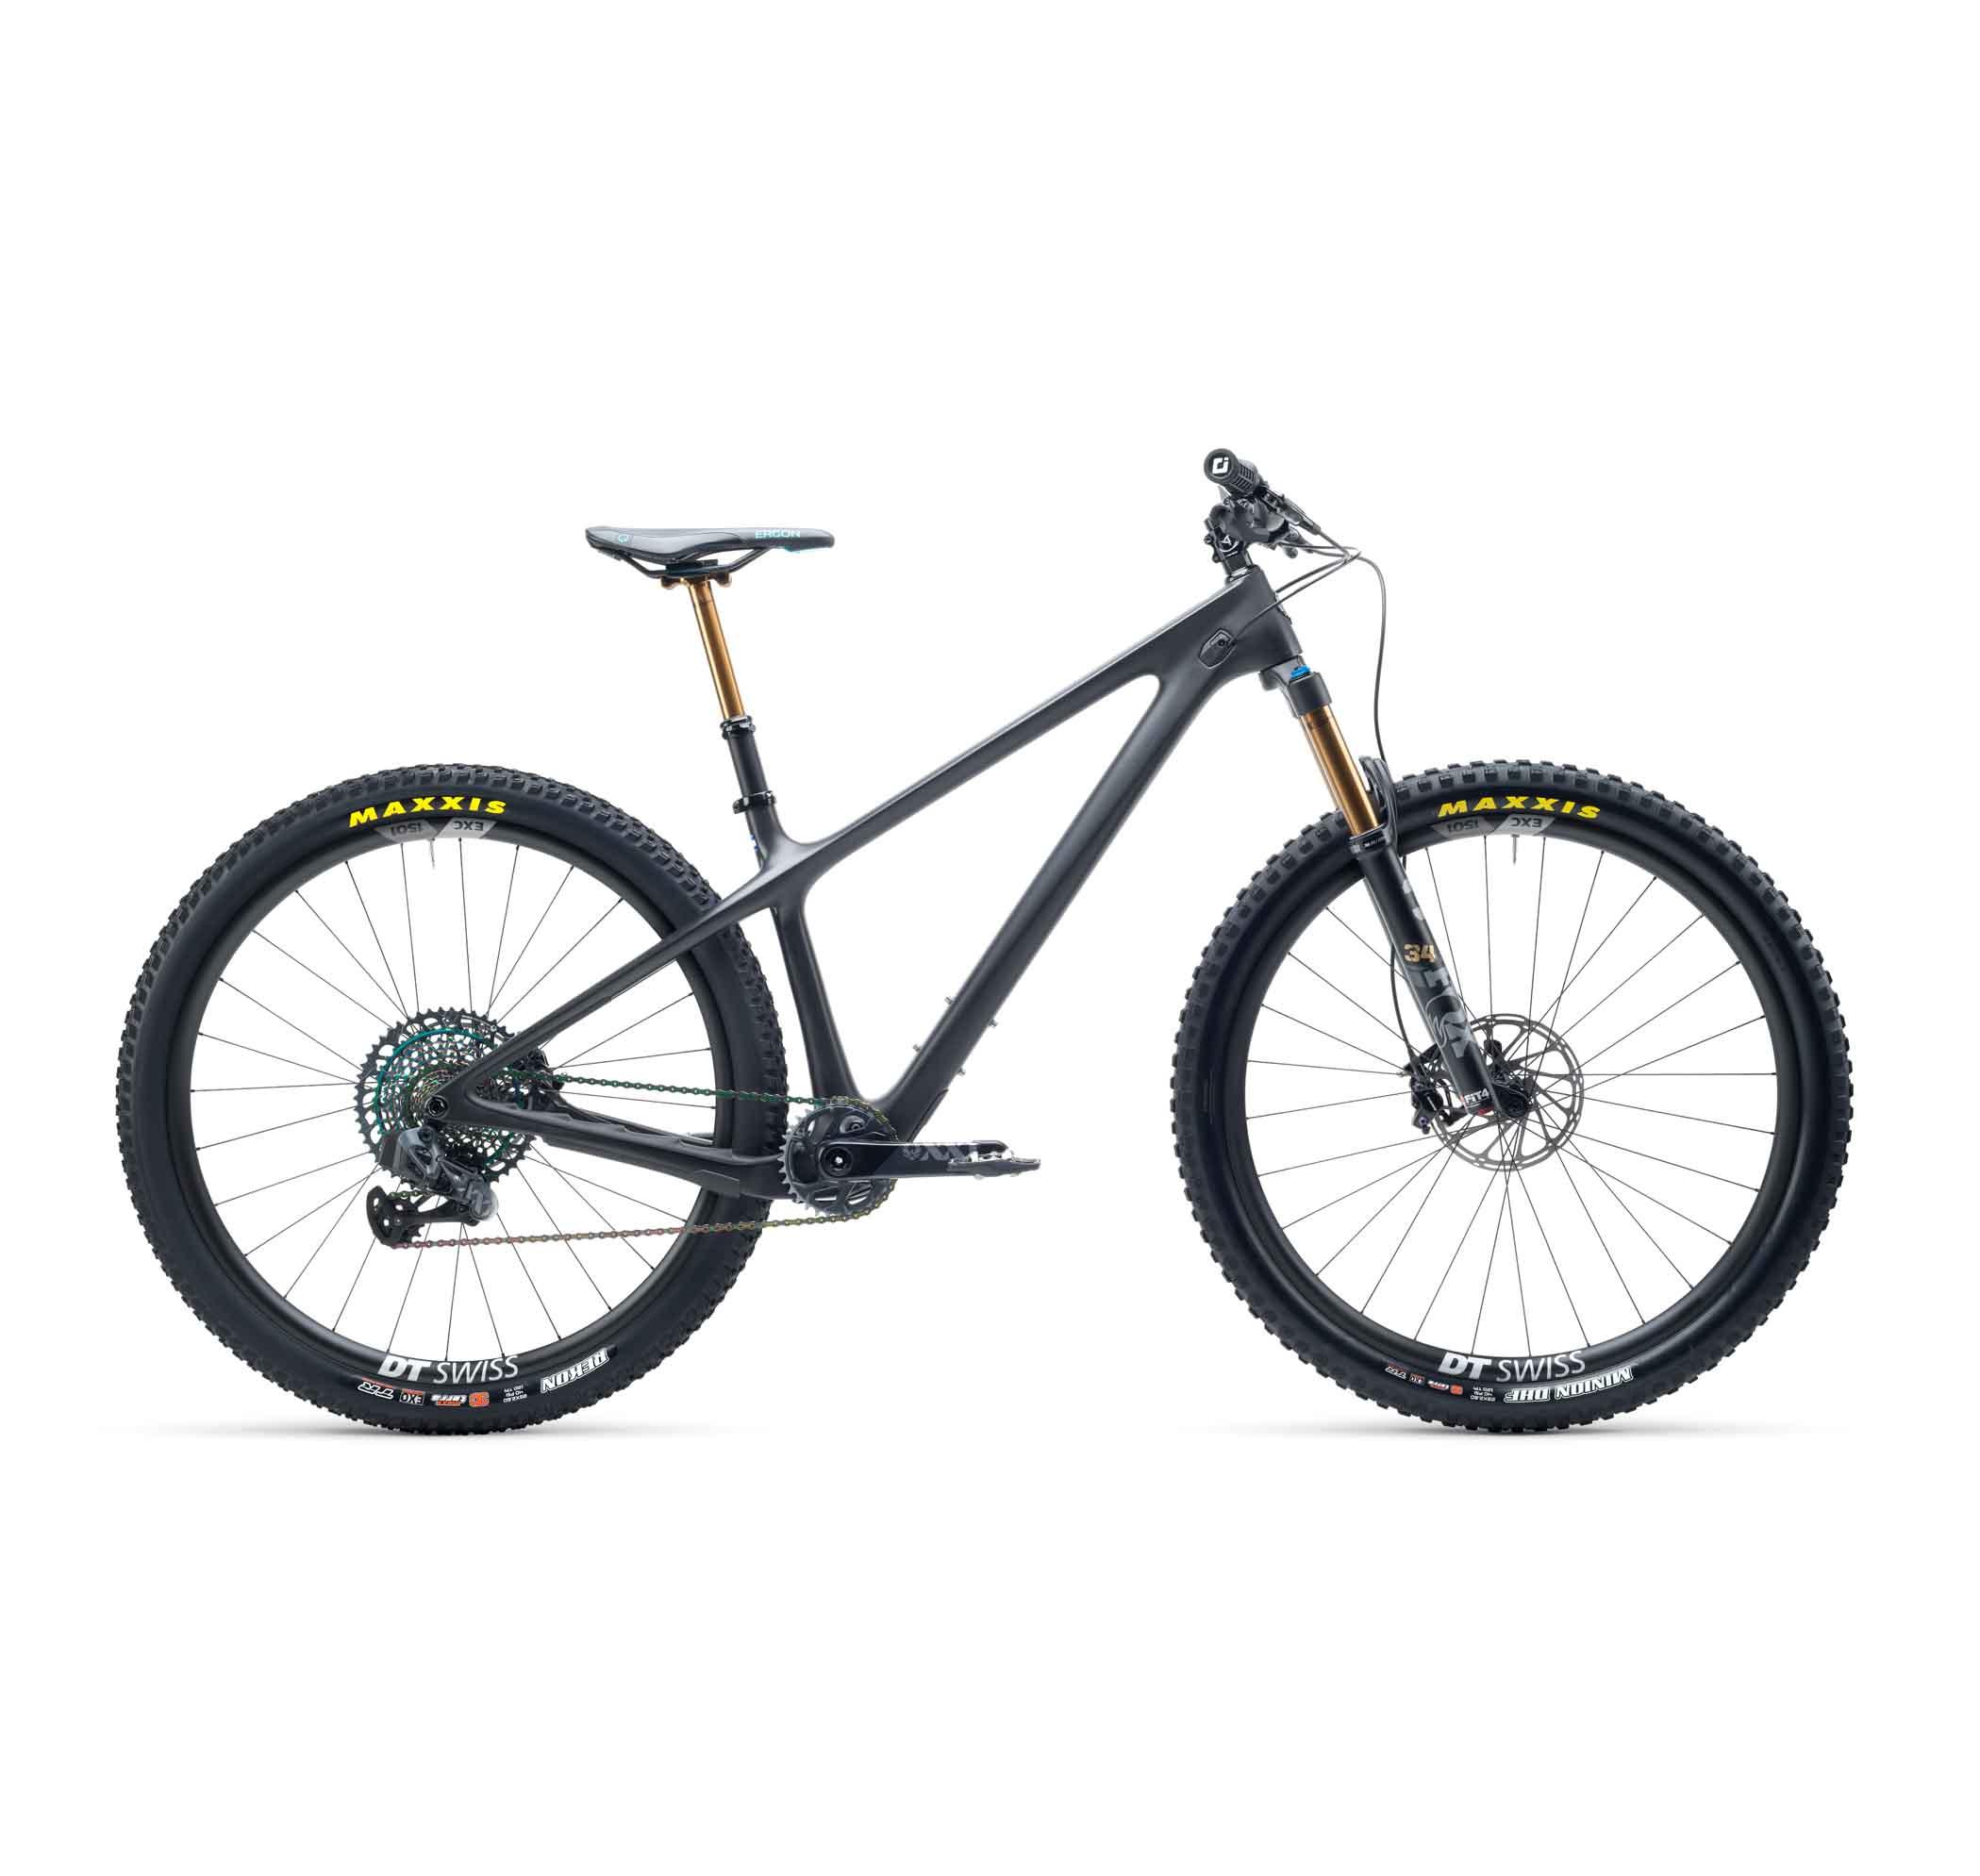 Yeti_Cycles_Rodeo_Bike_ARC_Black